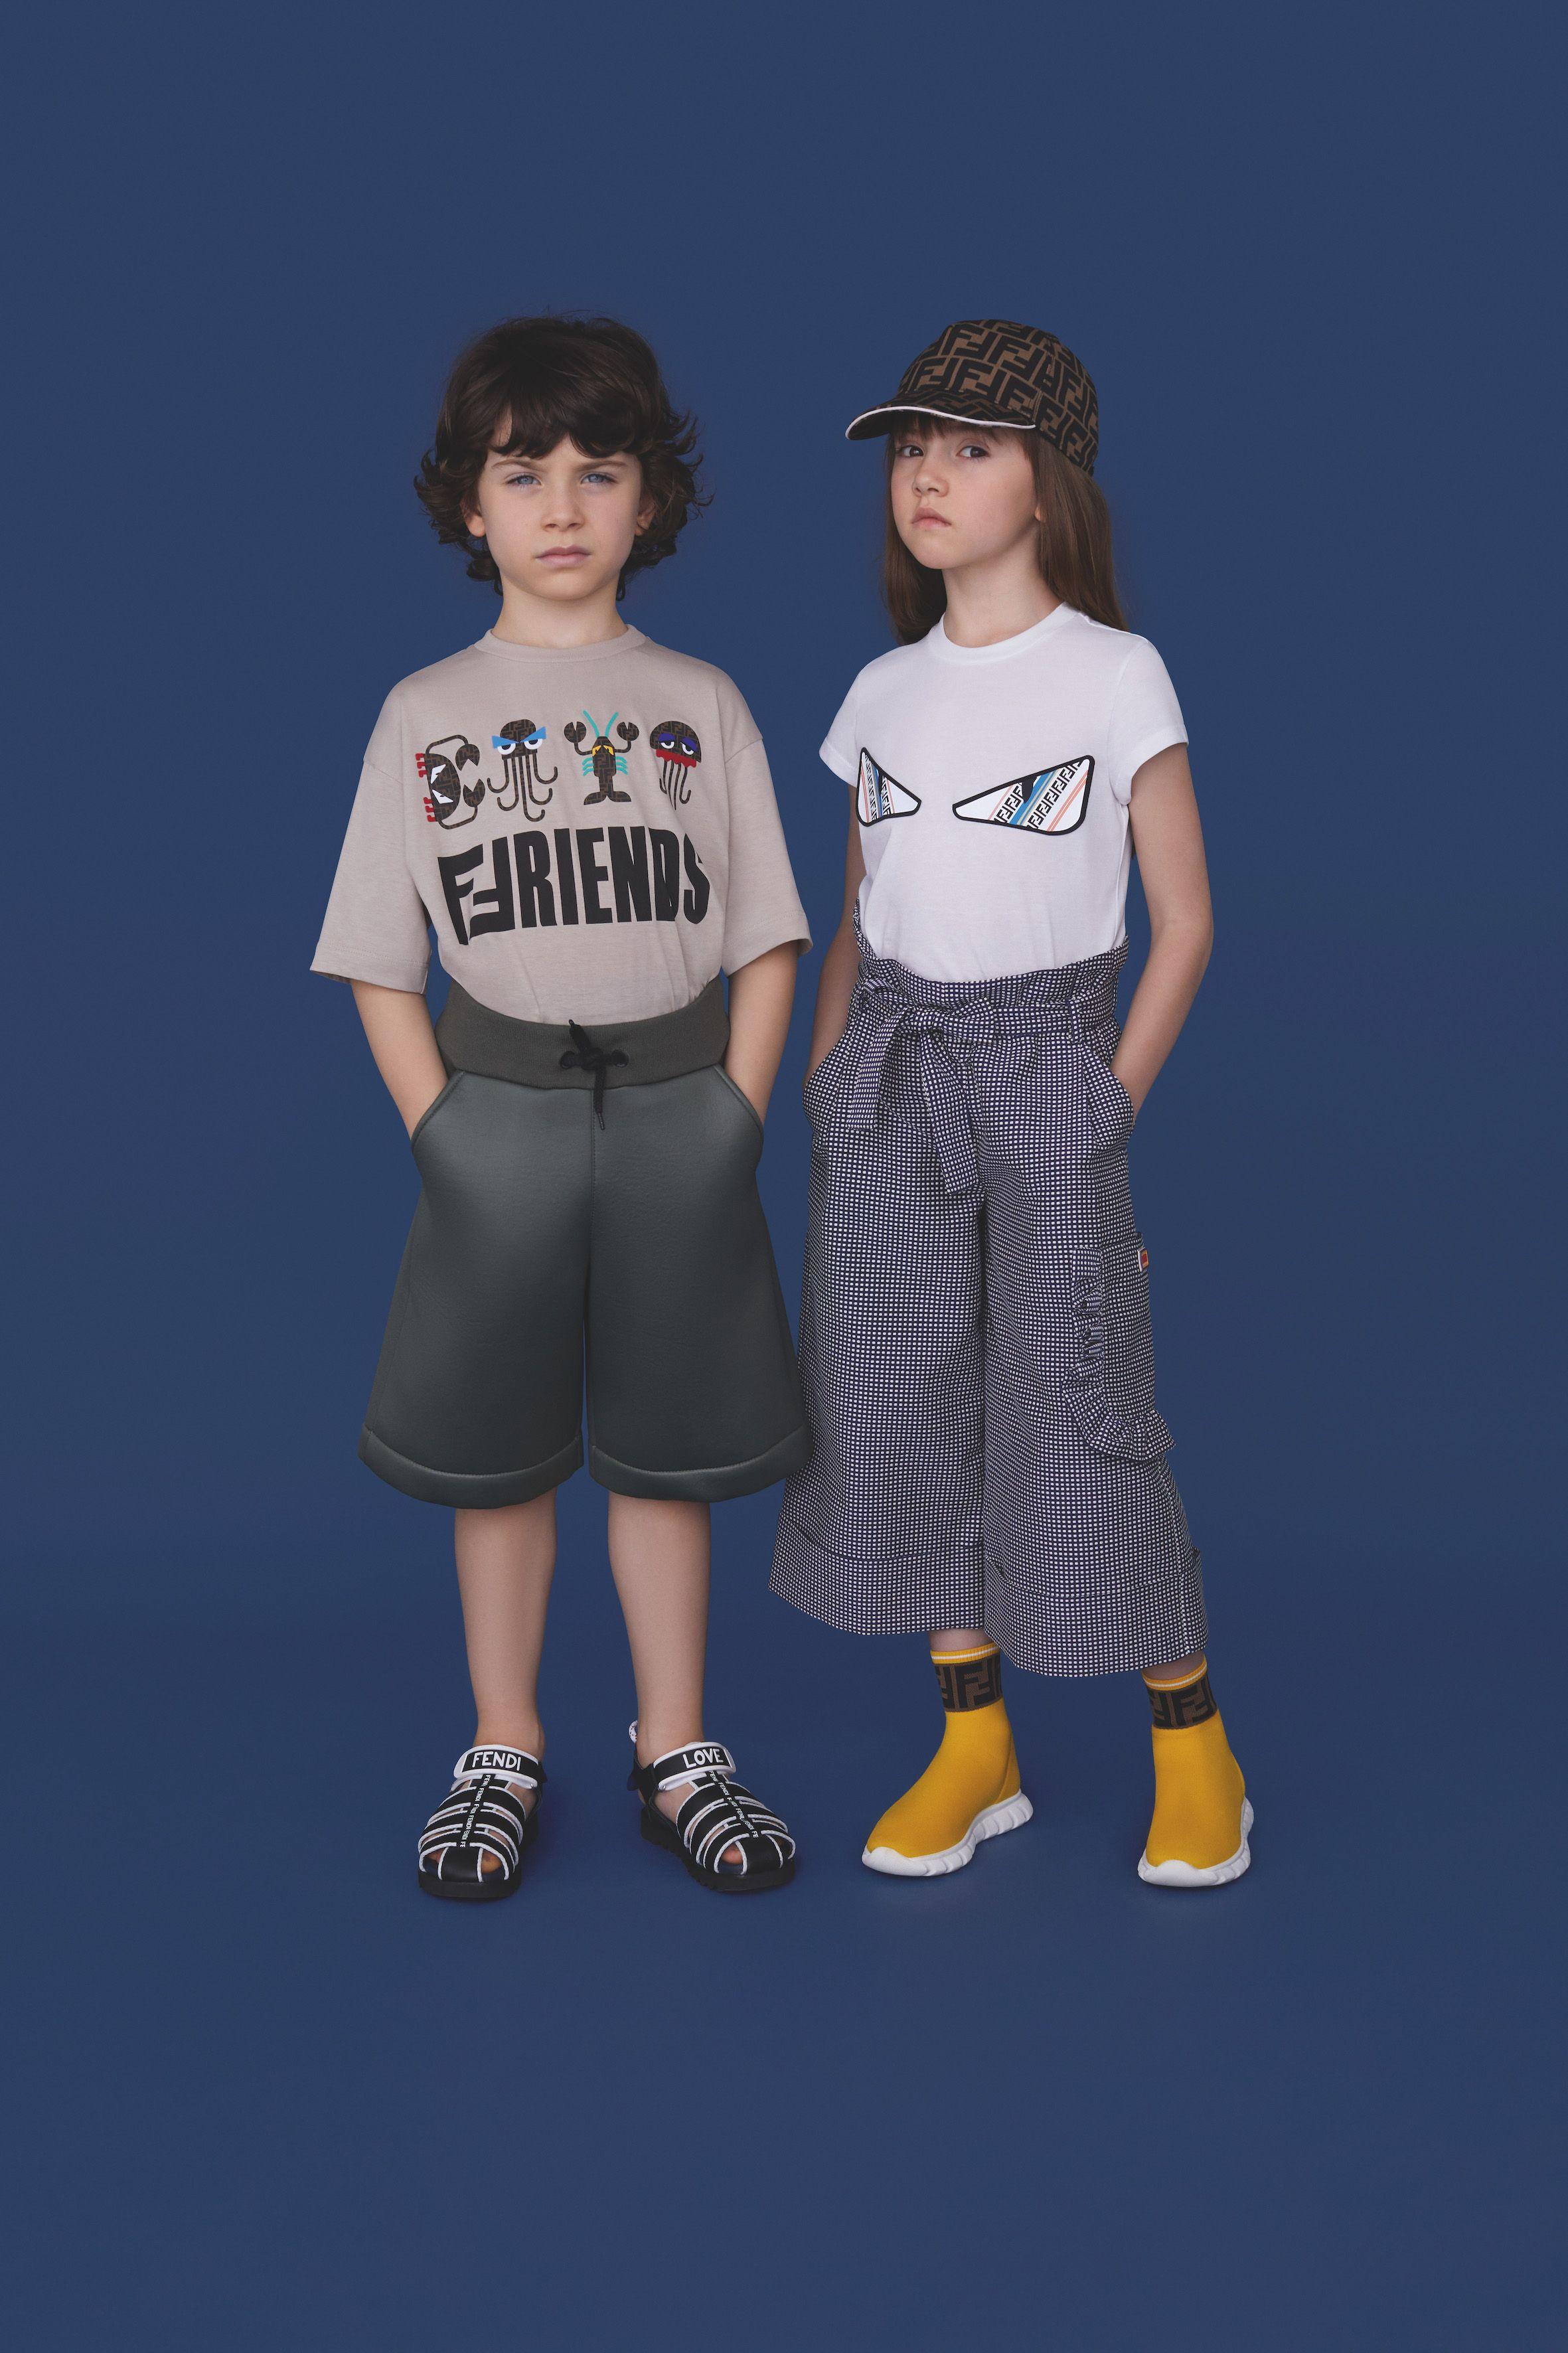 b5d409c1ea3c9 Fendi Kids Spring Summer 2019 Collection